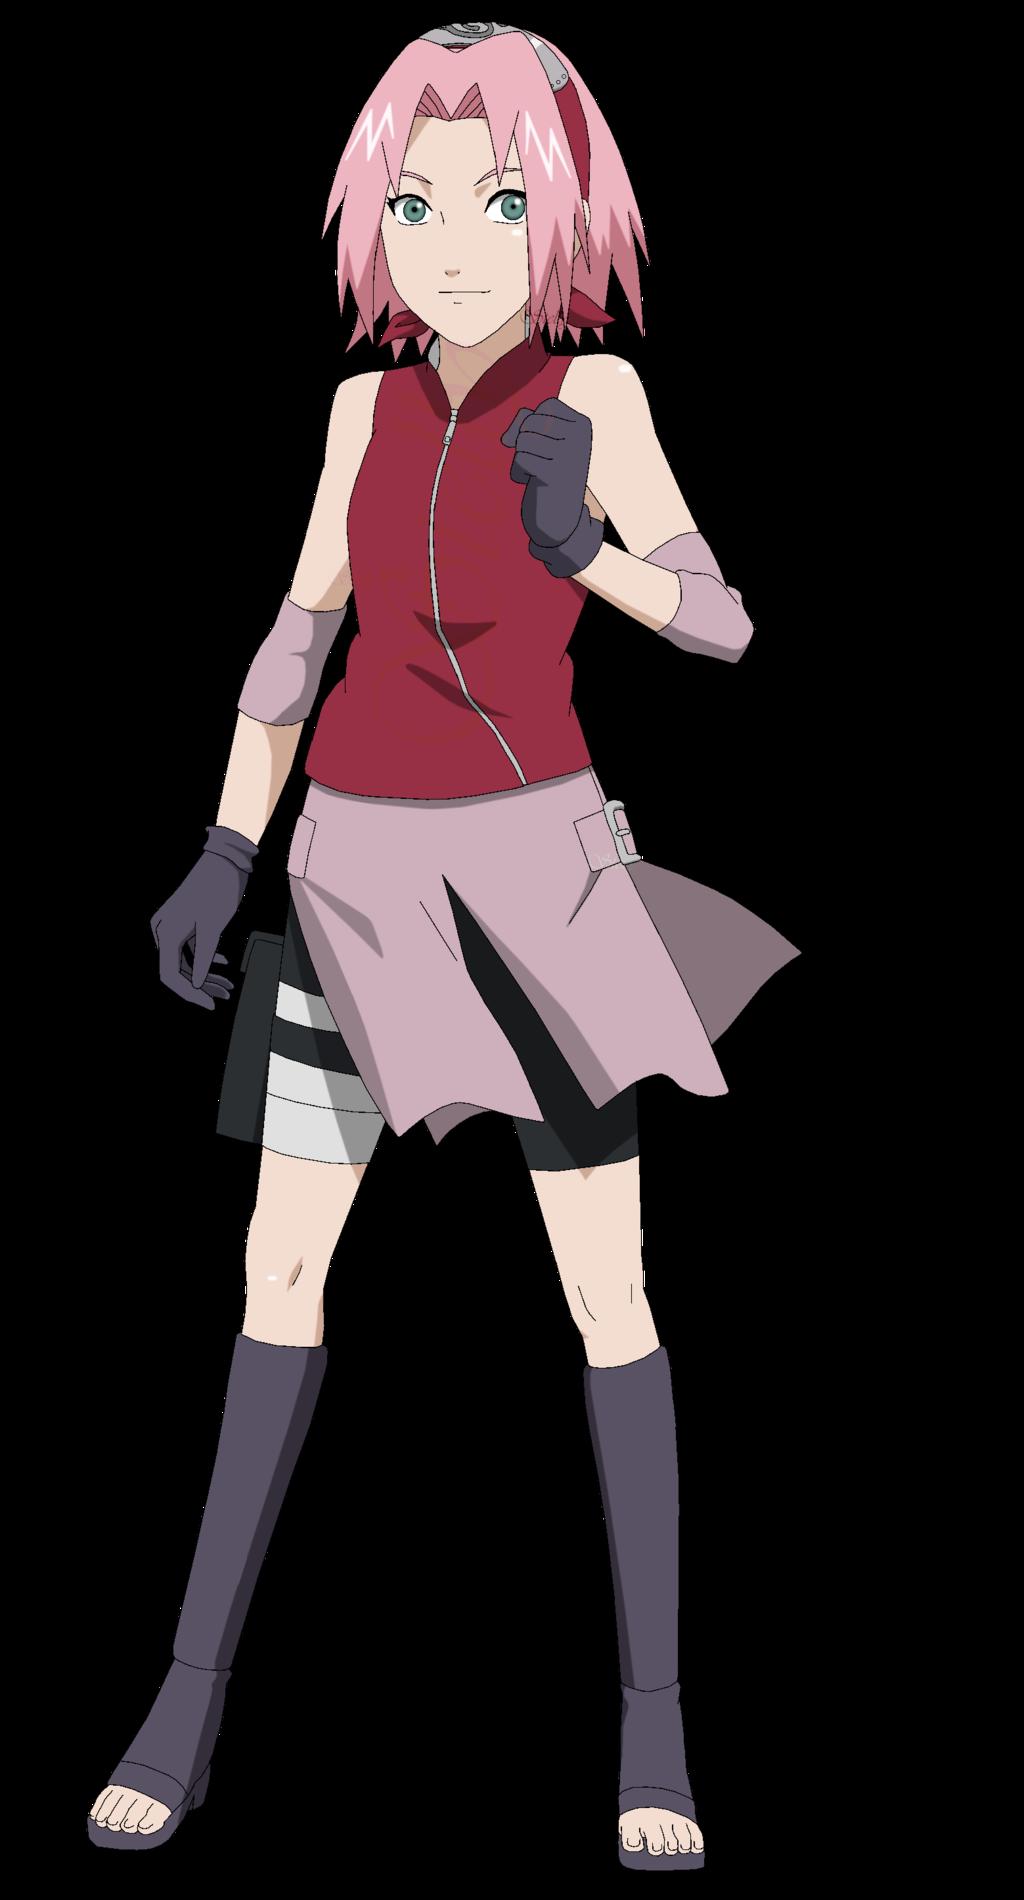 Sakura Haruno Shippuden Lineart Colored By Dennisstelly Naruto